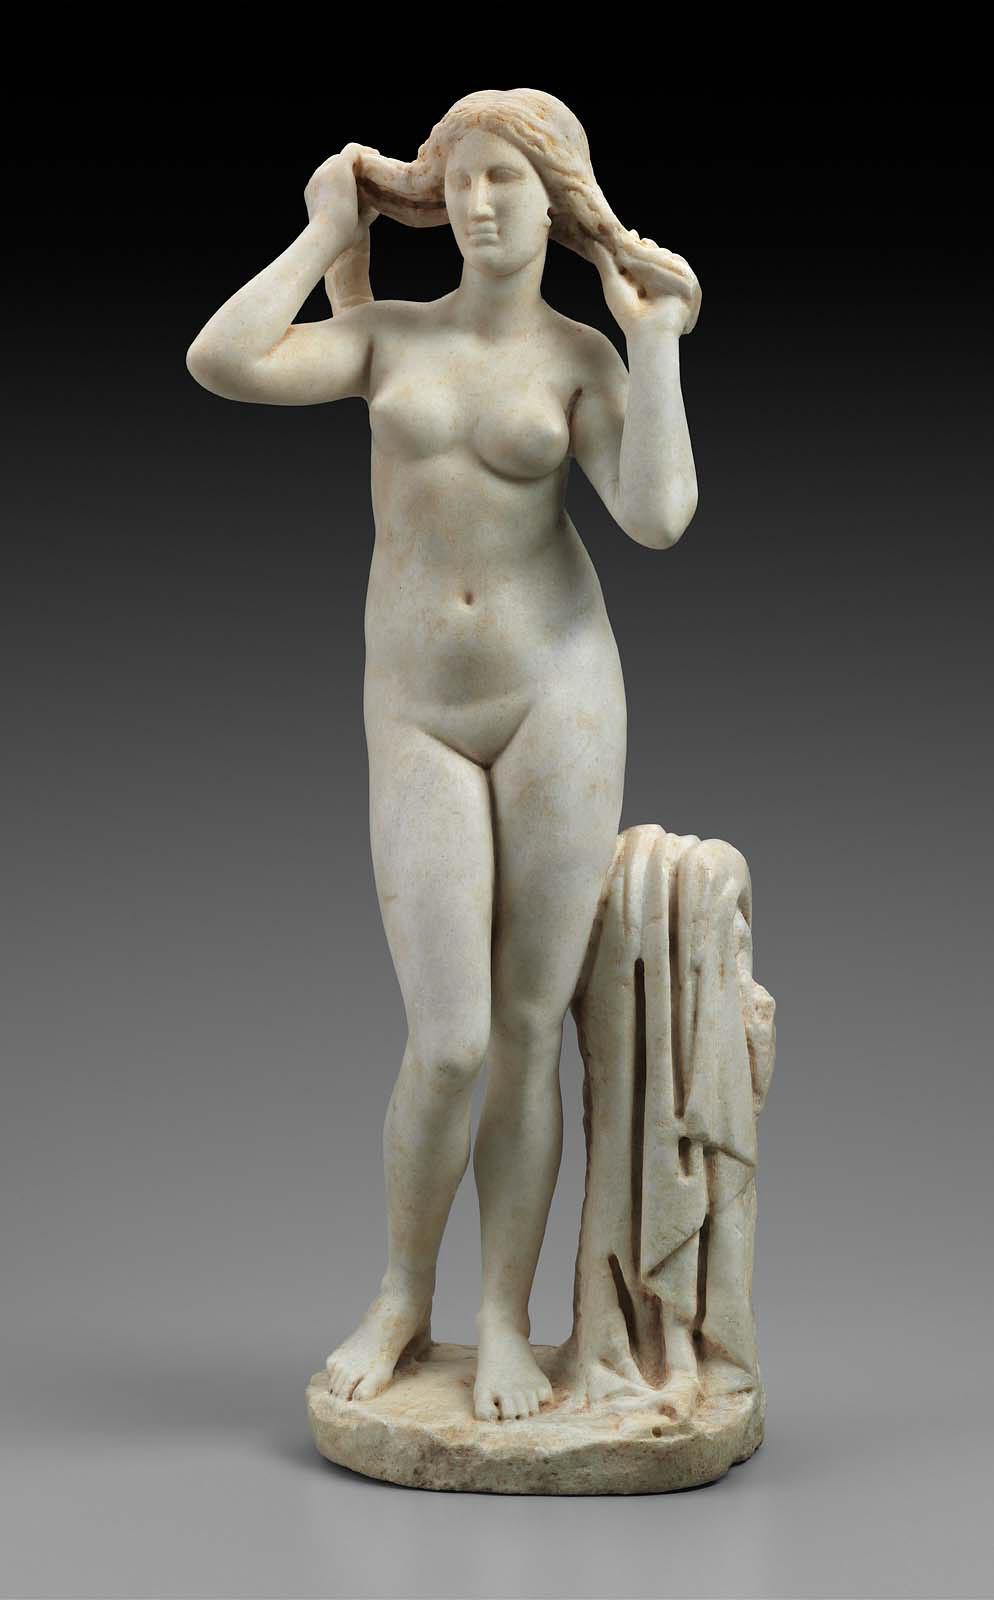 Free nude mature woman